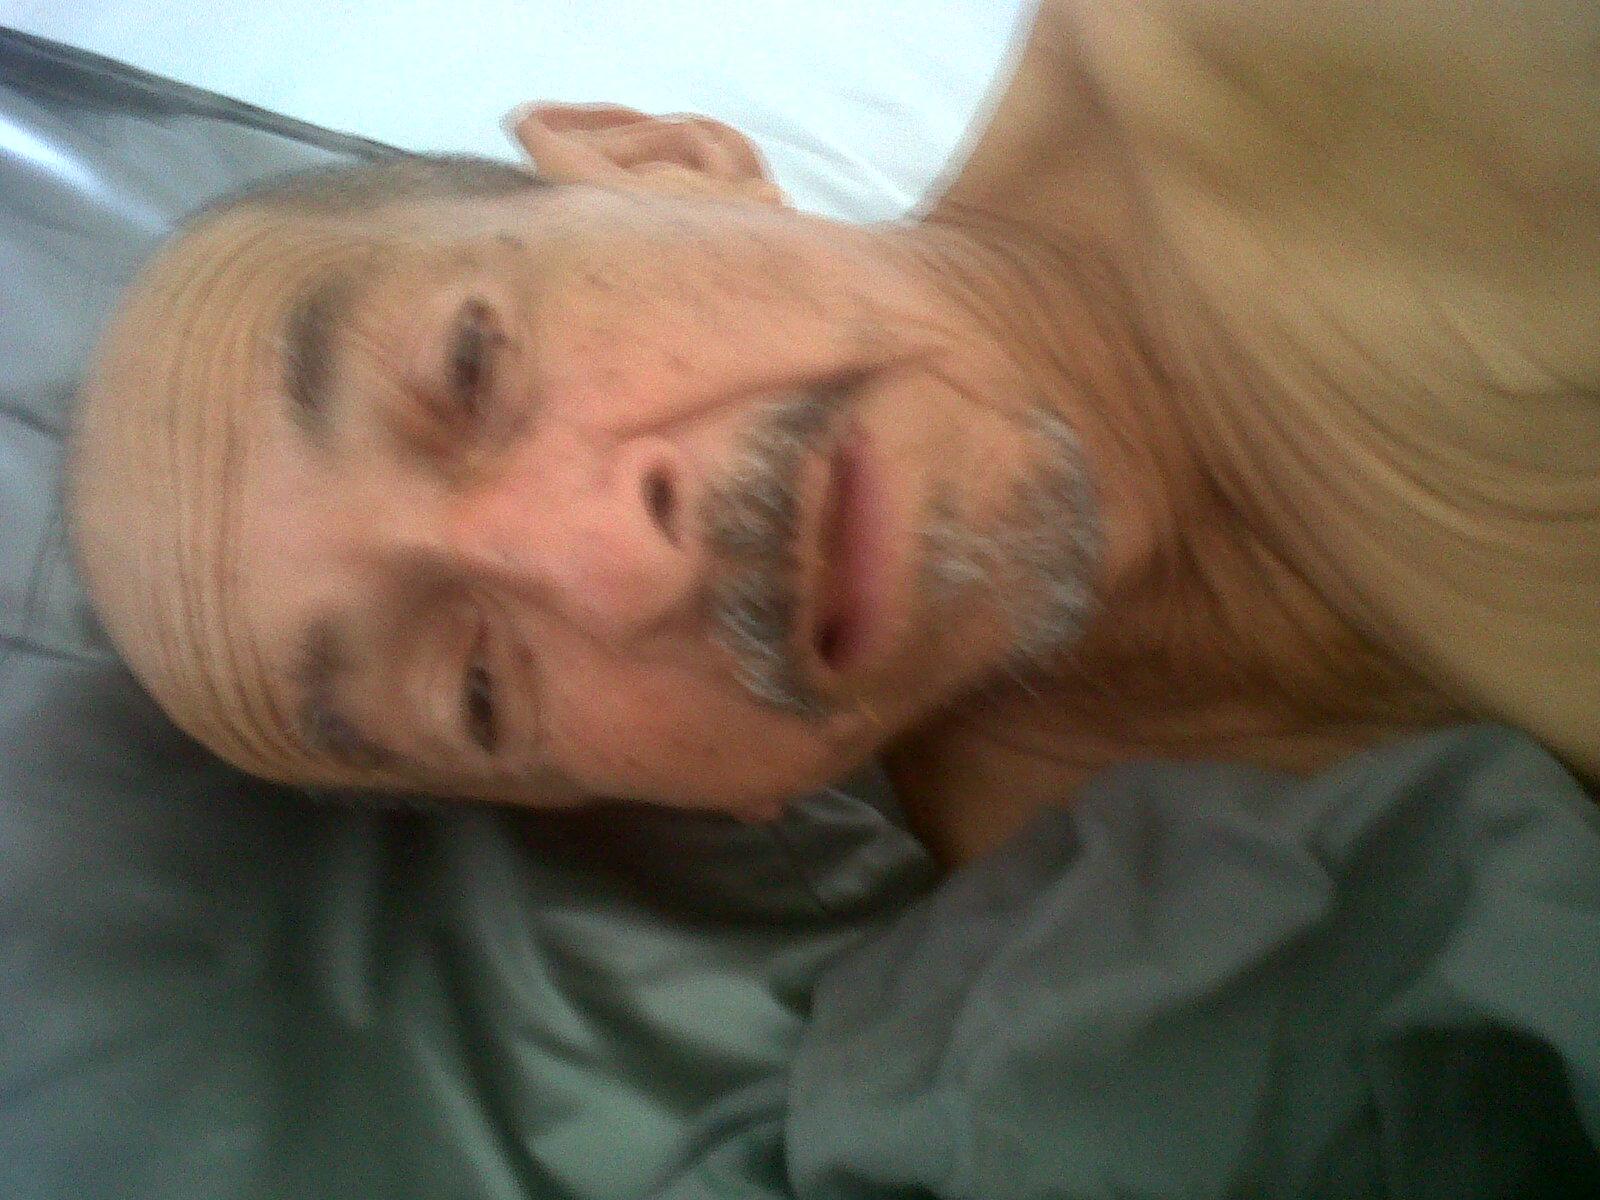 José Leonel Morales, paciente del HUV, busca a su familia